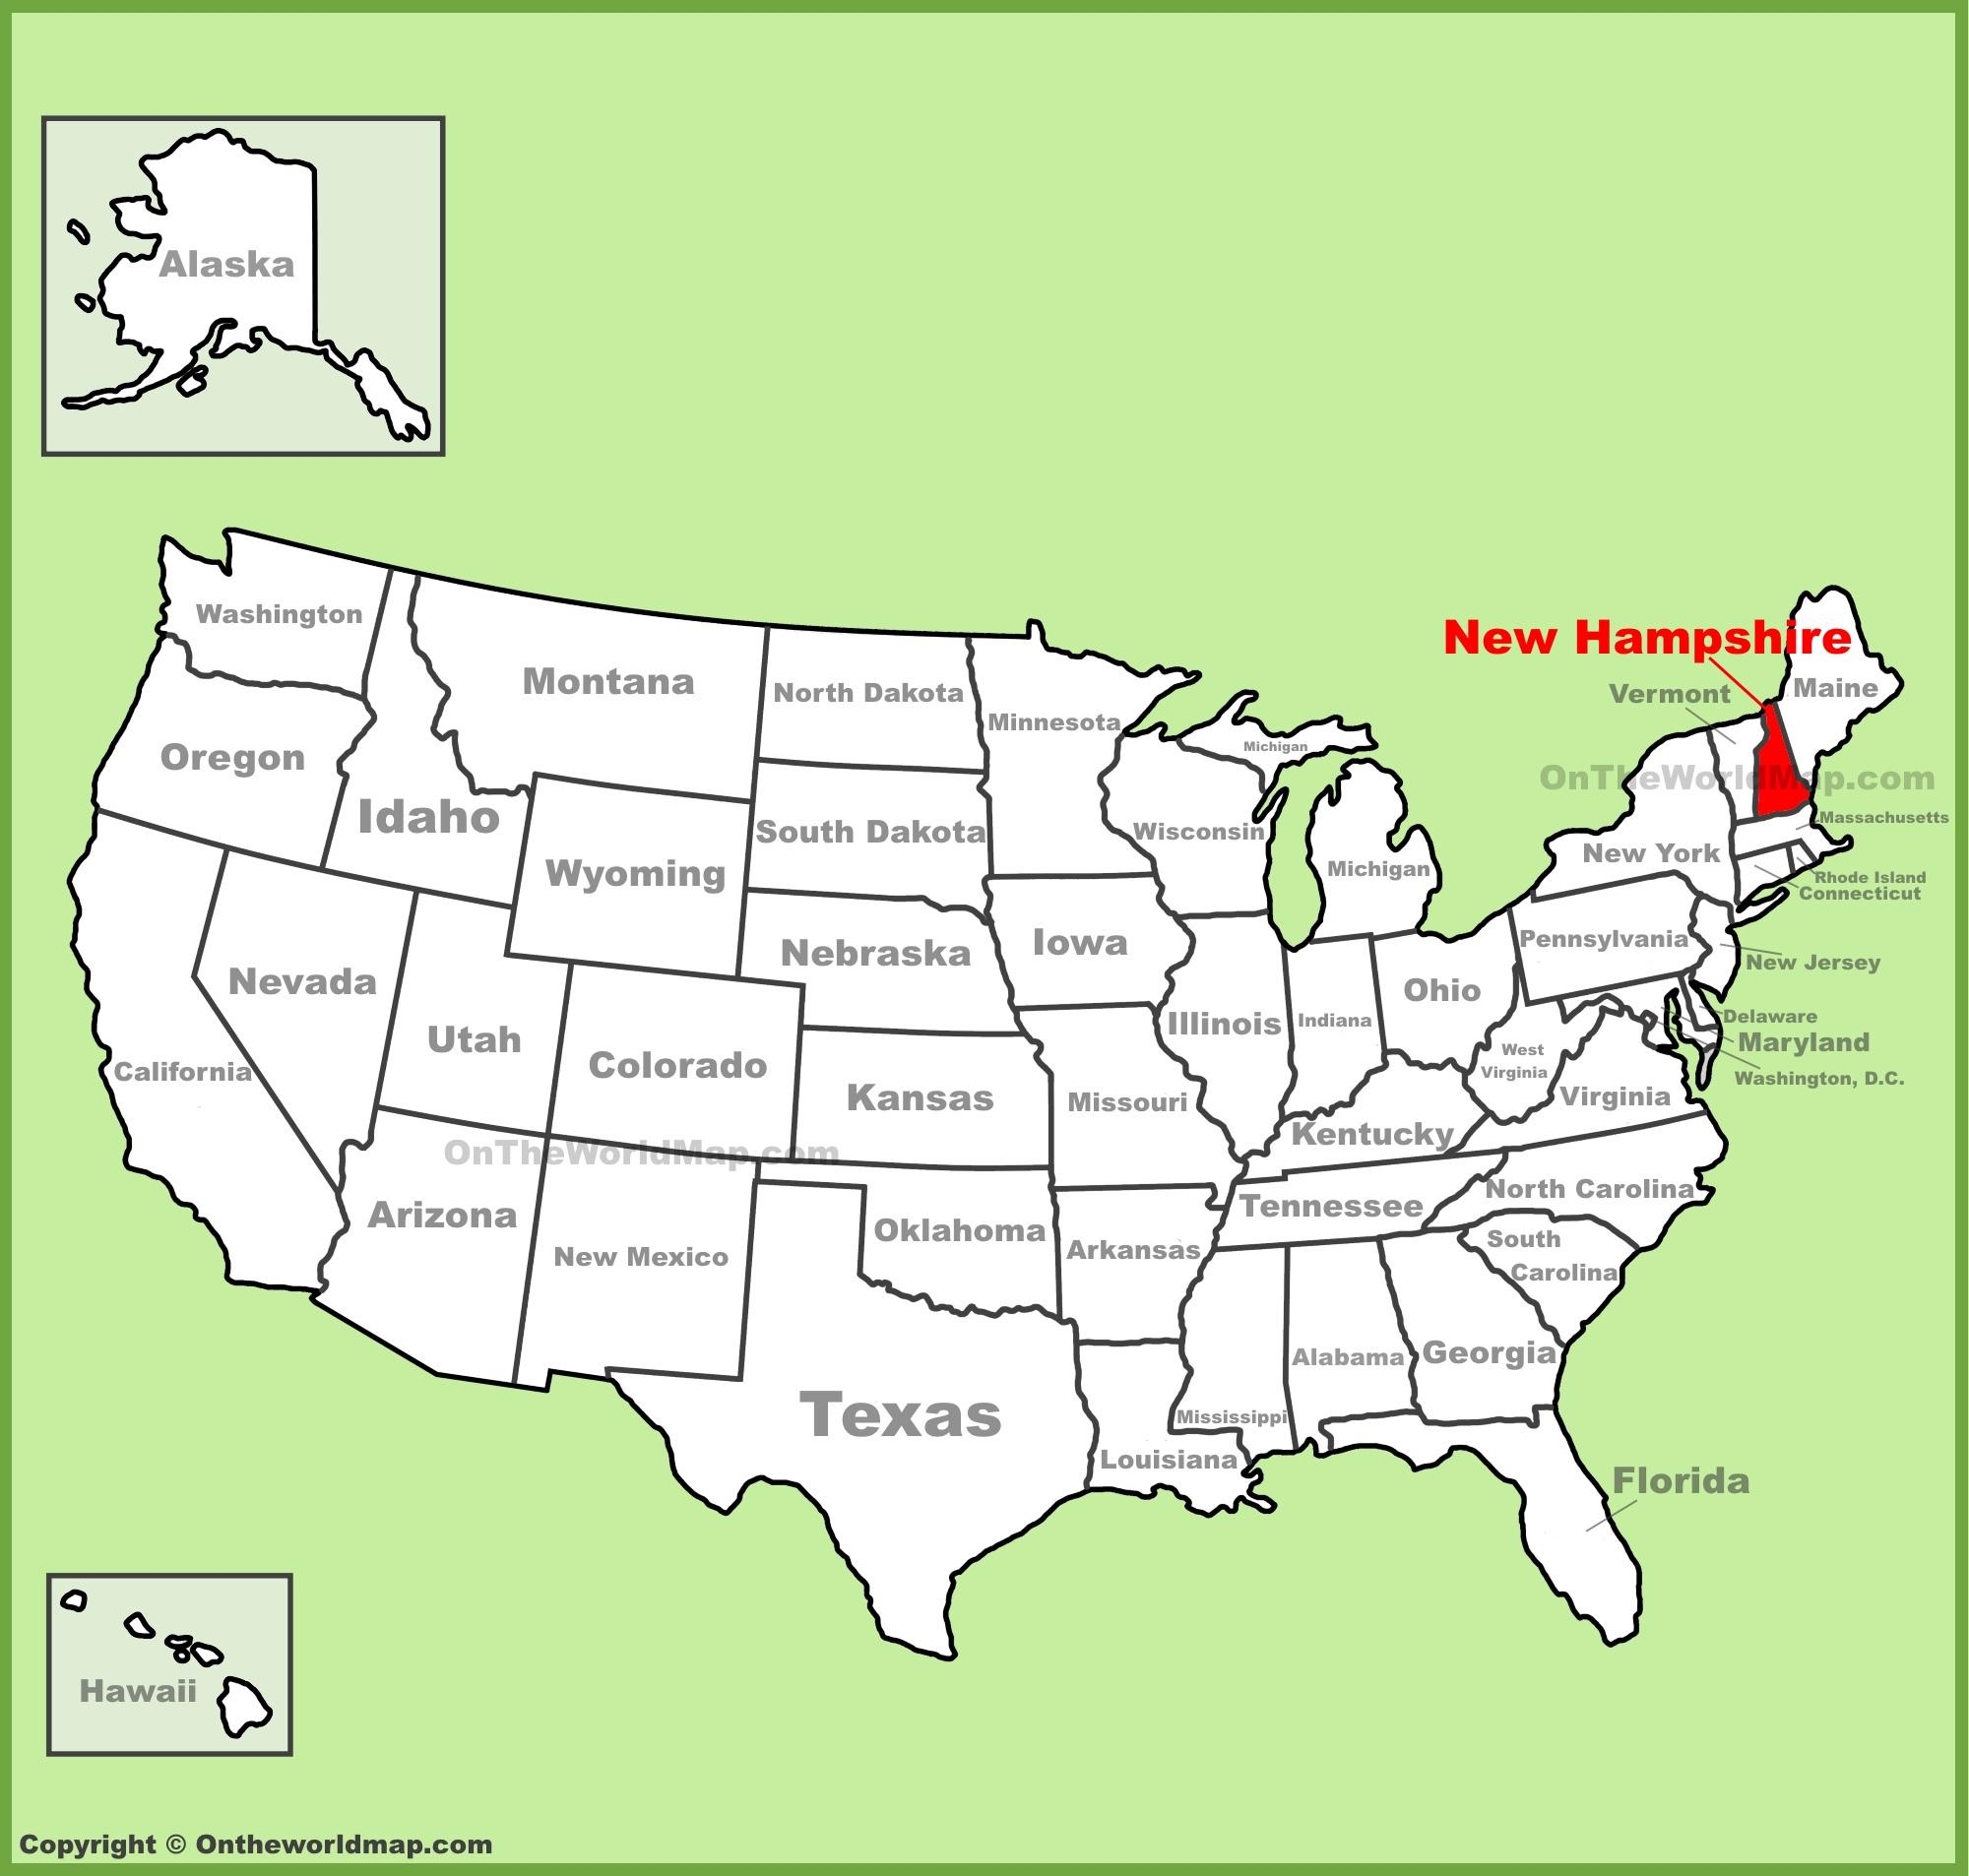 New Hampshire Map New Hampshire State Maps | USA | Maps of New Hampshire (NH) New Hampshire Map